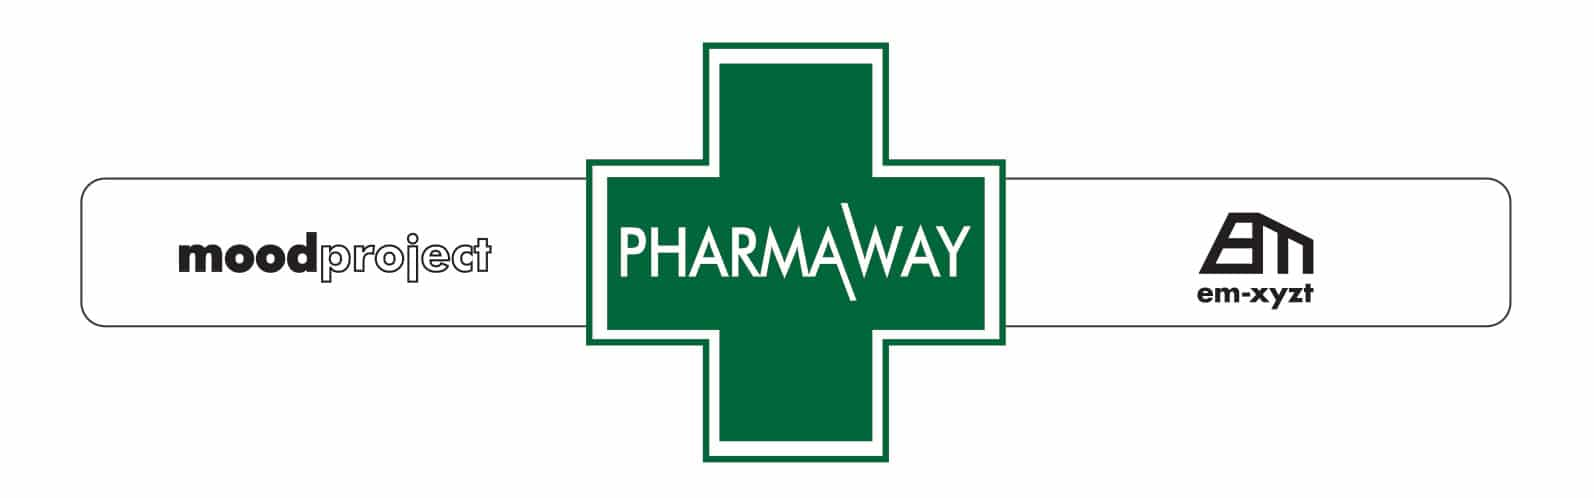 pharmaway moodproject emxyzt